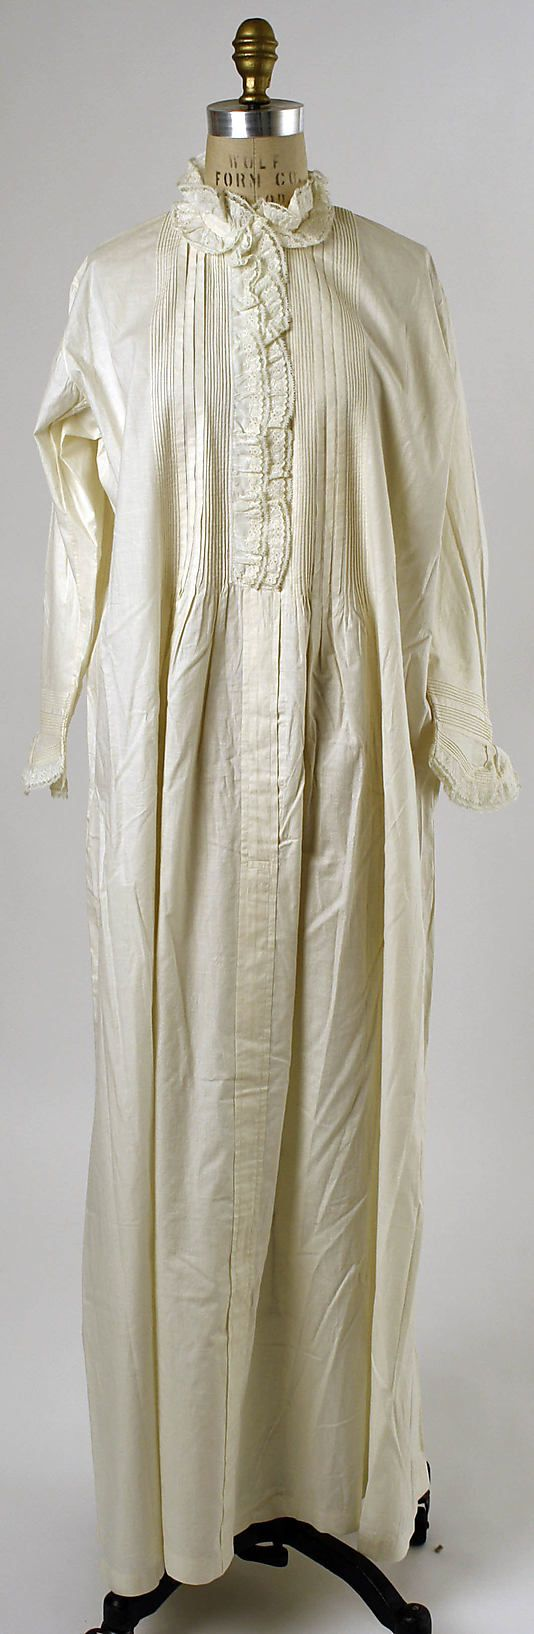 Nightgown Date: 1880s Culture: American Medium: cotton Dimensions: Length (sf): 58 in. (147.3 cm)